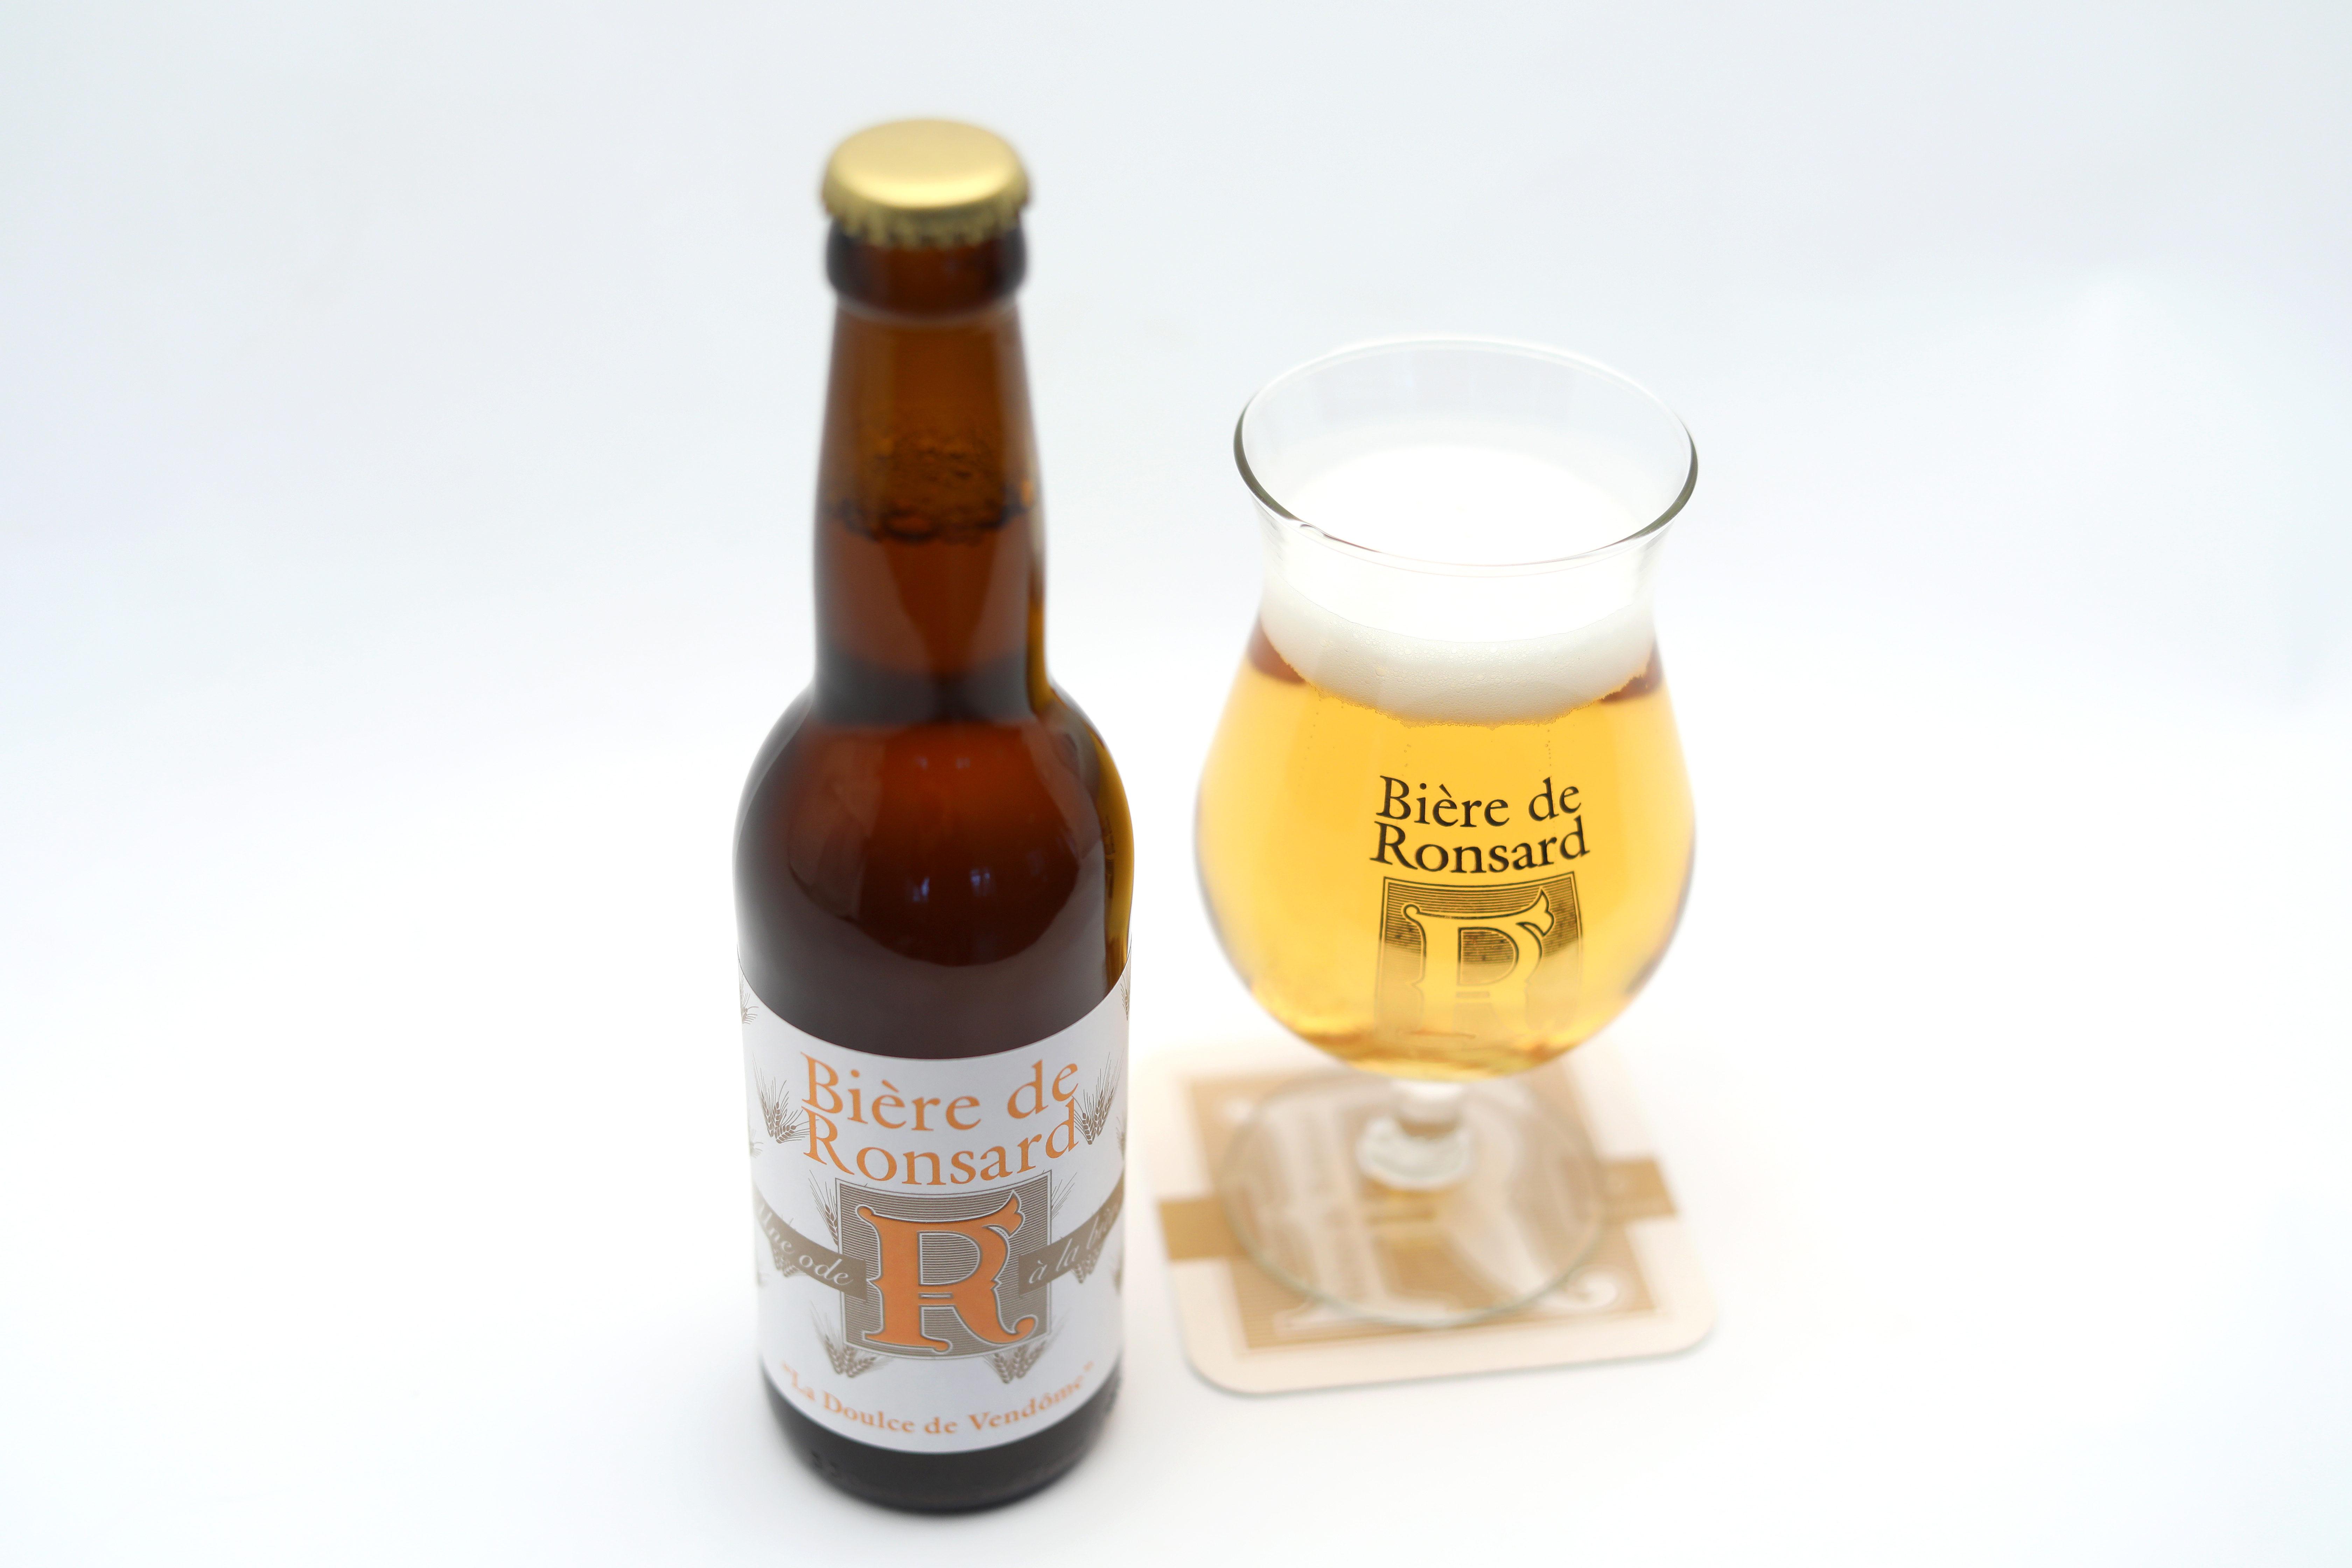 Bière de Ronsard - Brasserie Guillaume